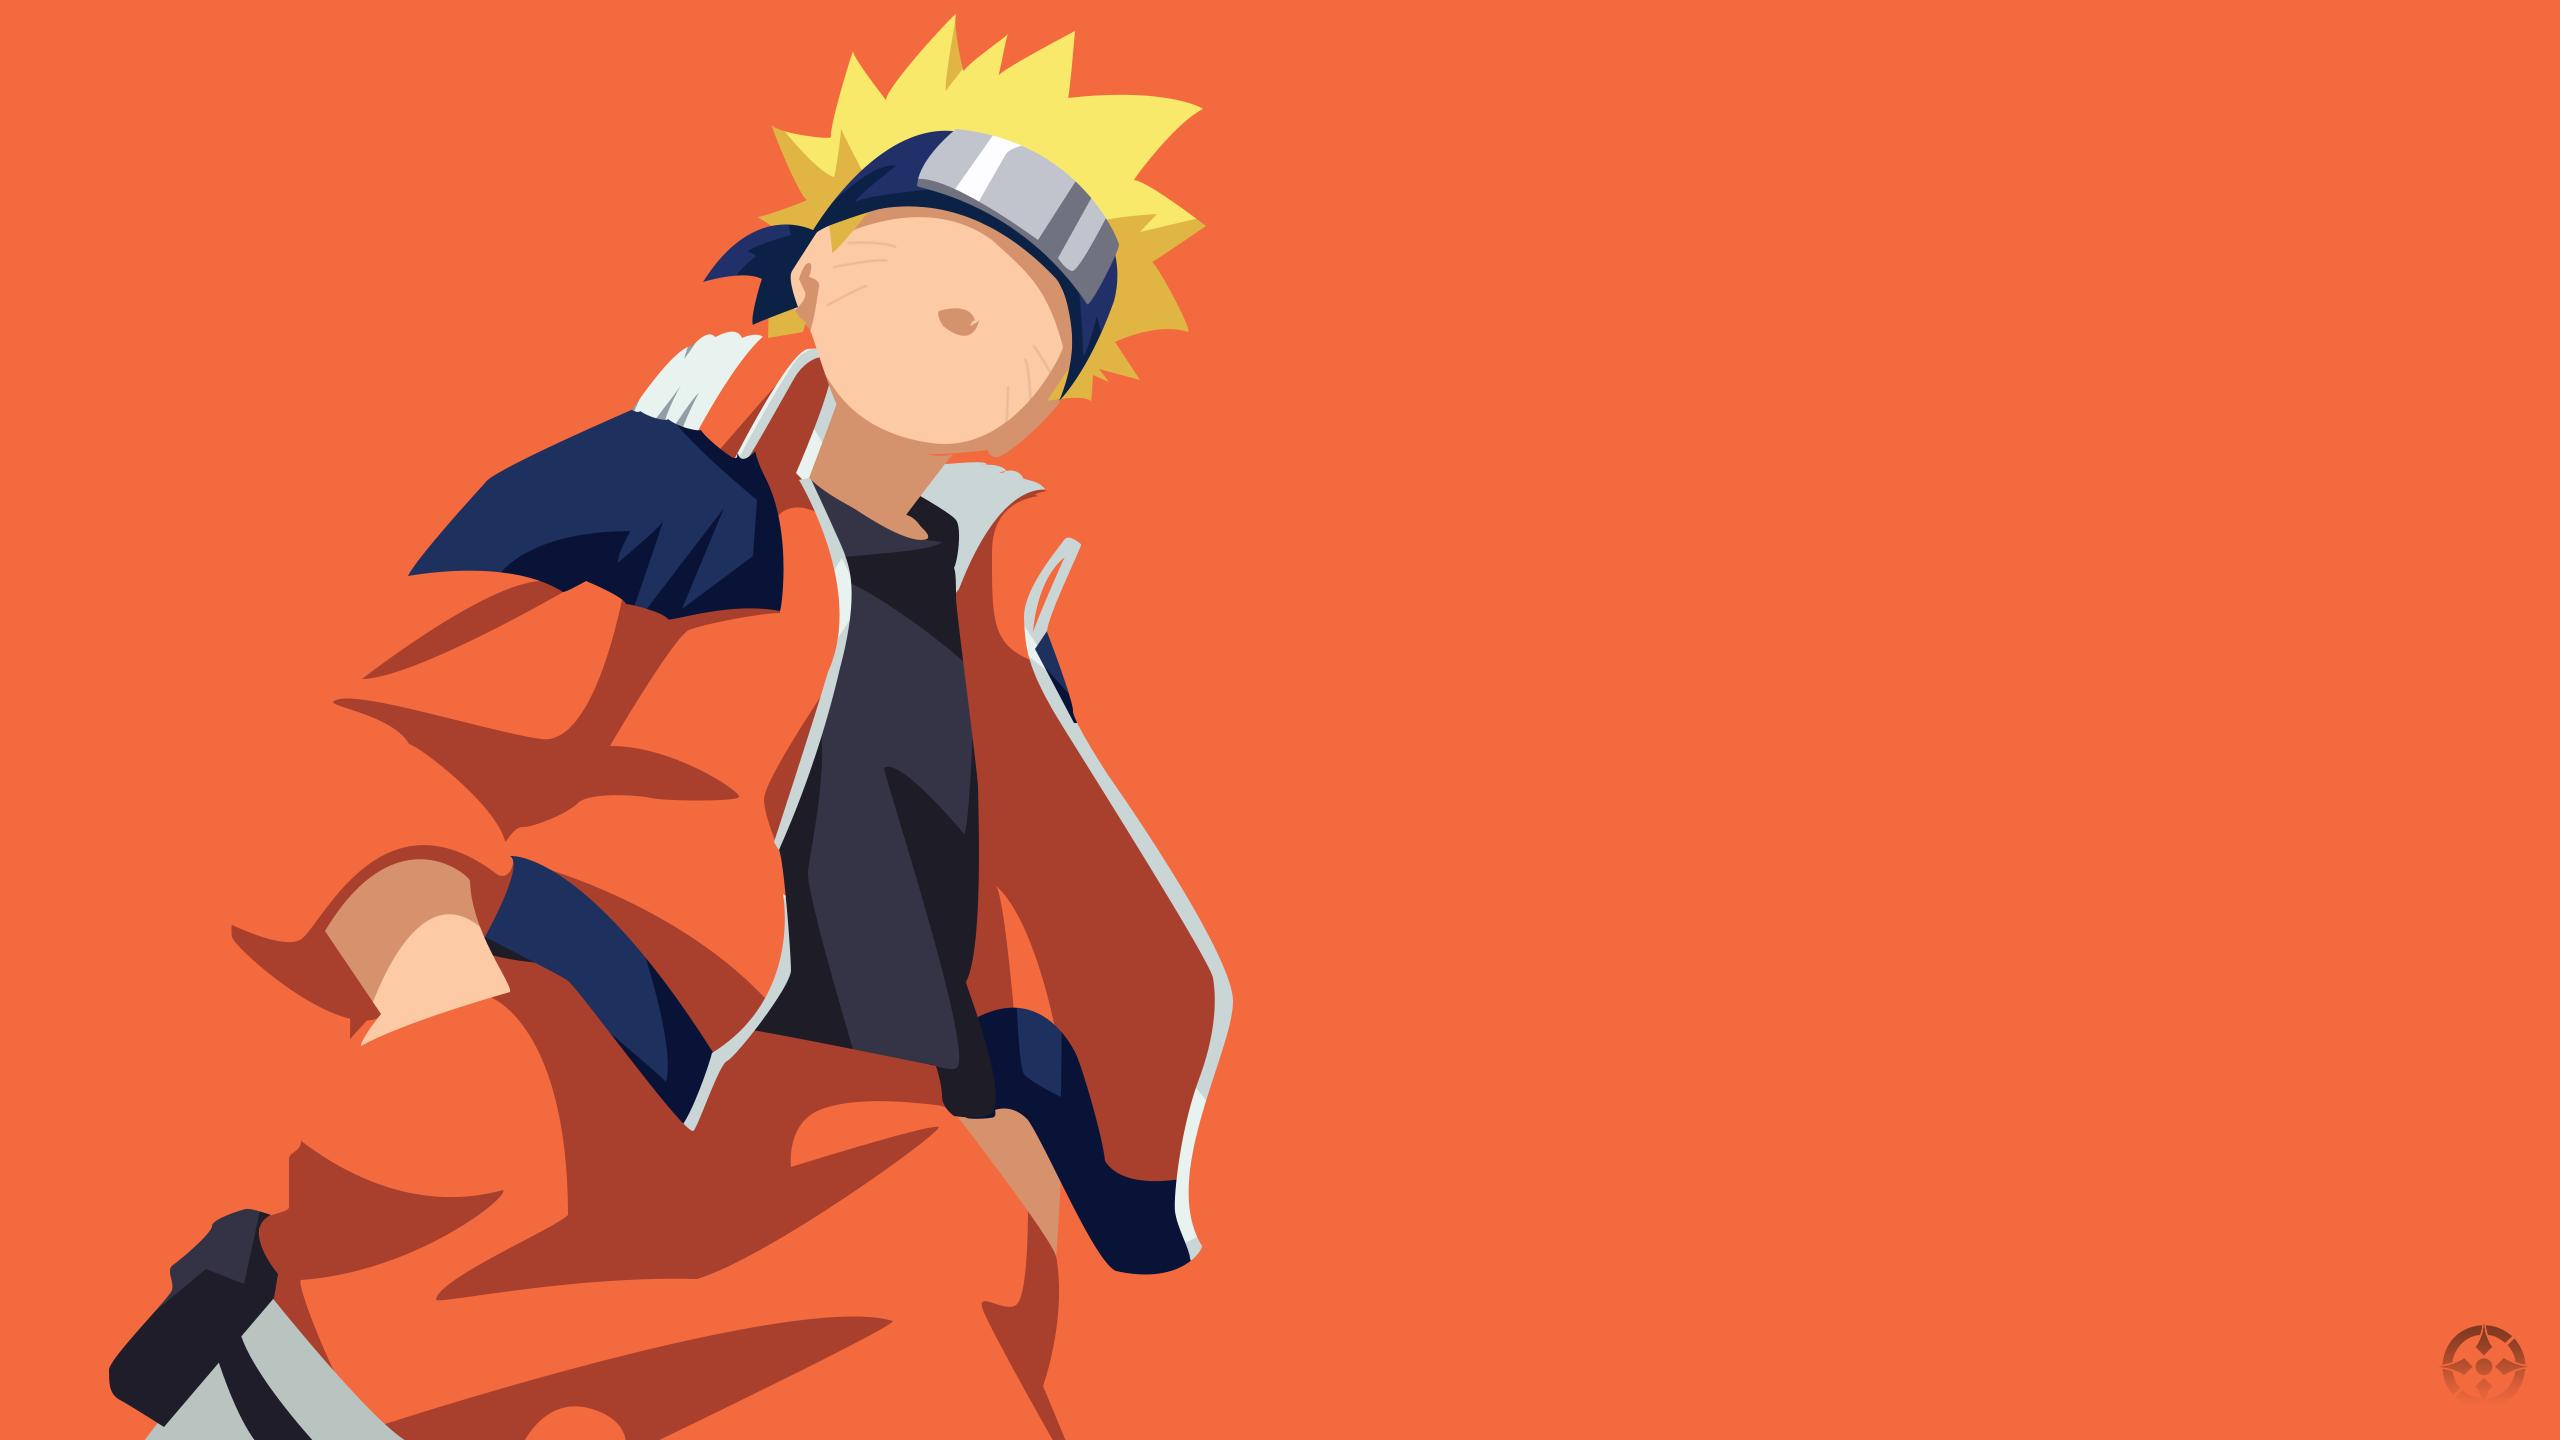 Gambar Keren Anime Naruto Dekstop Wallpaper